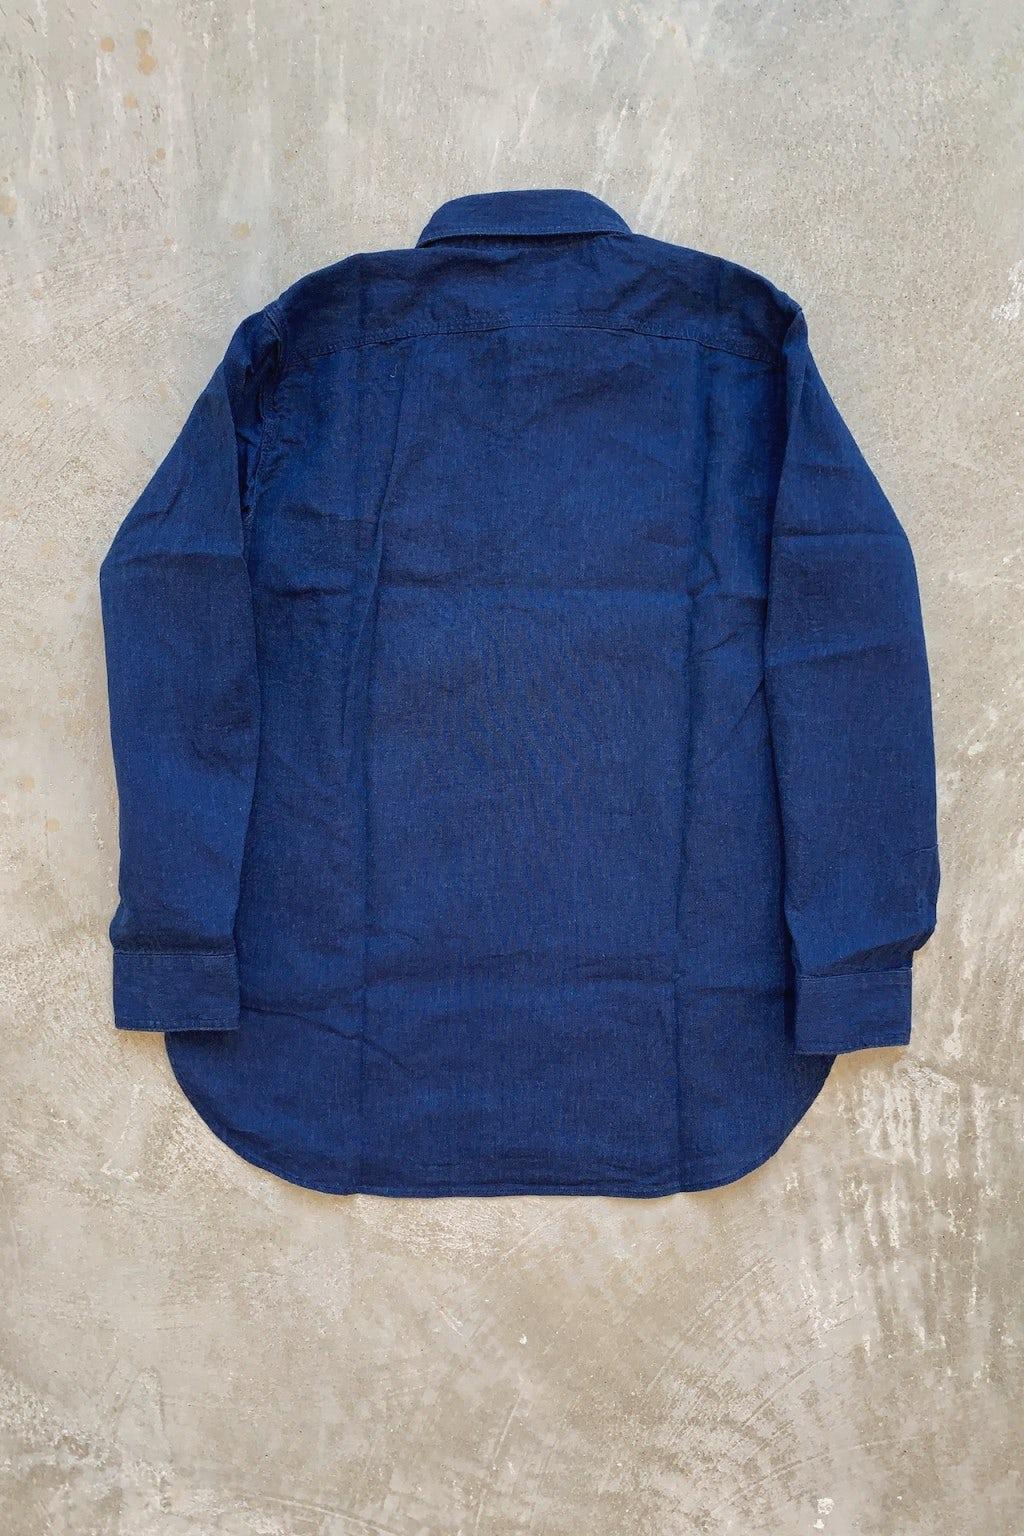 Engineered Garments Classic Shirt Navy